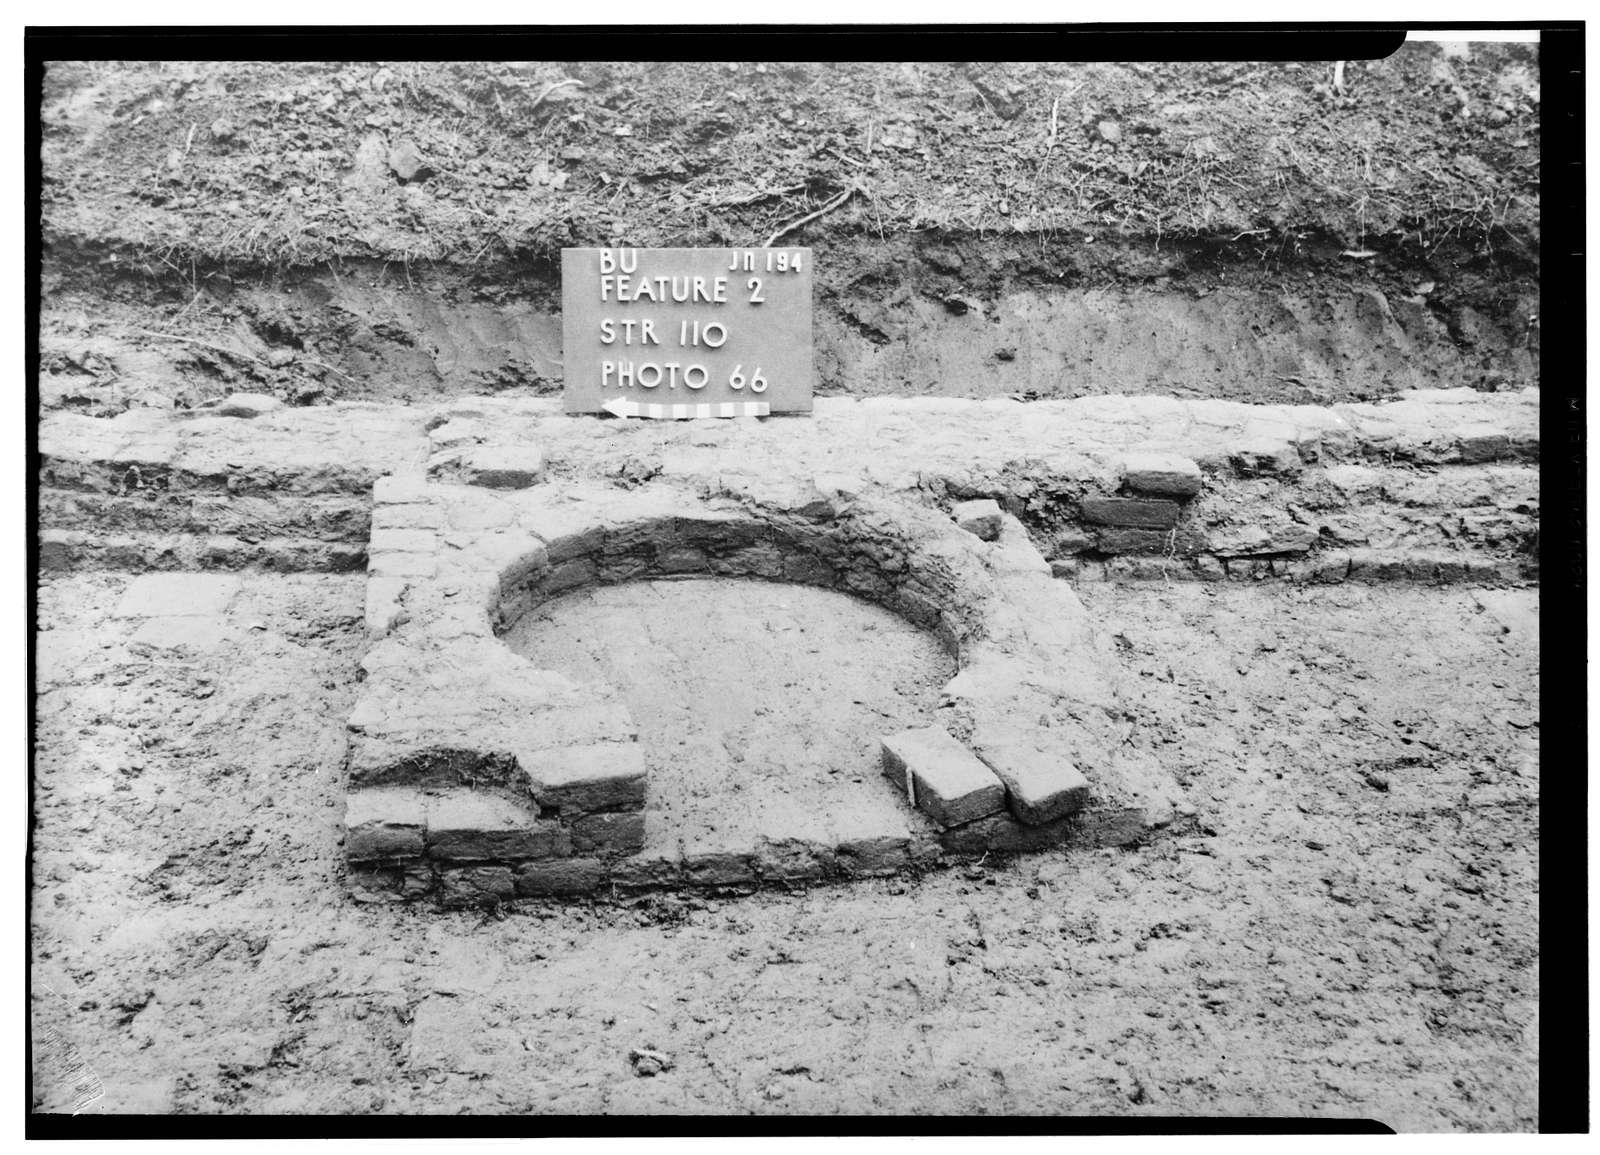 Architectural Remains, Unit B, Structure 110, Jamestown, James City County, VA